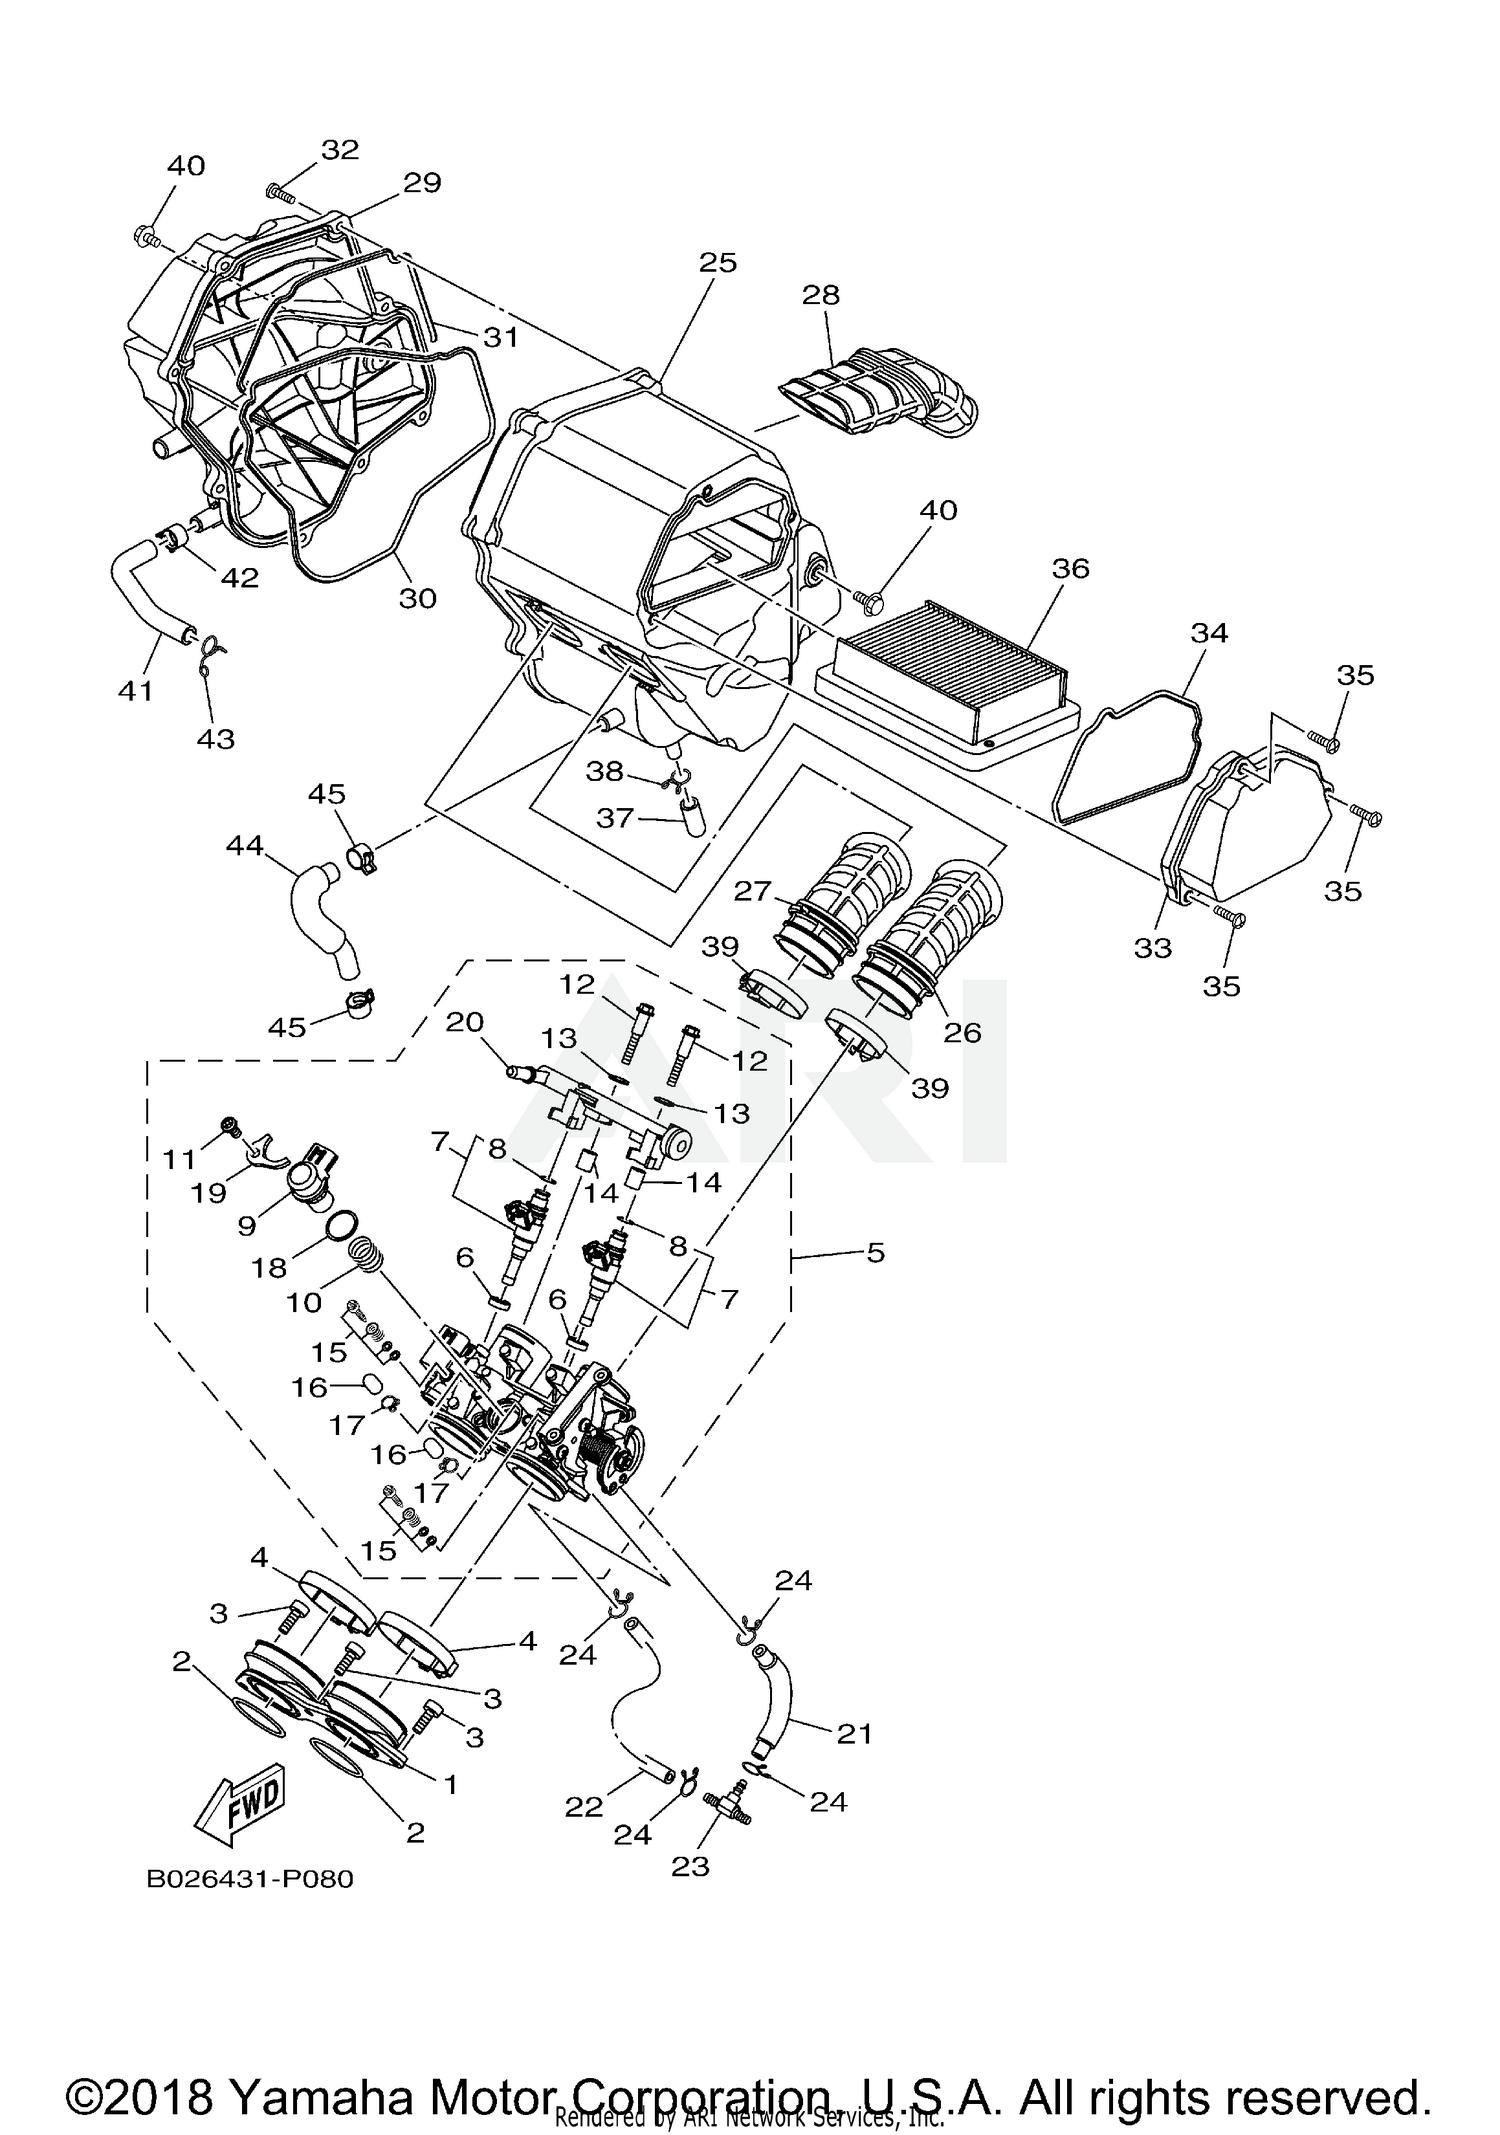 2018 Yamaha R3 - YZFR3JB INTAKE Parts - Best OEM INTAKE Parts ...